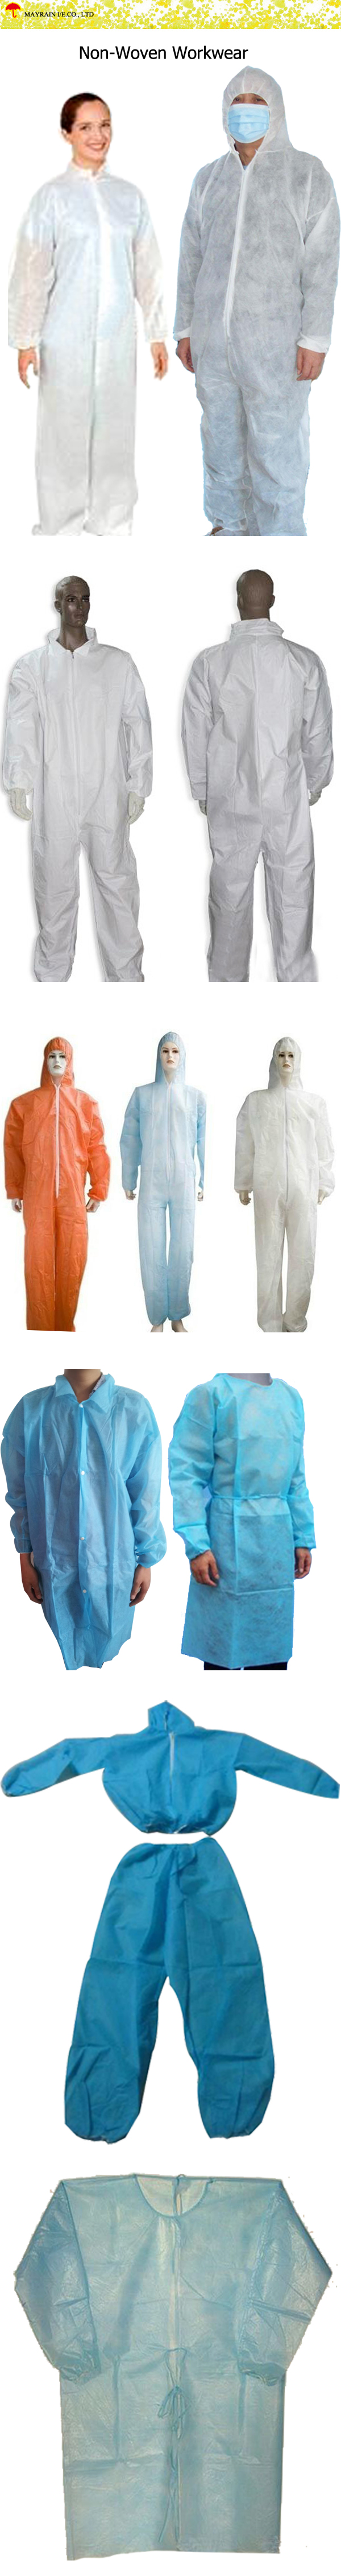 Non-Woven Workwear